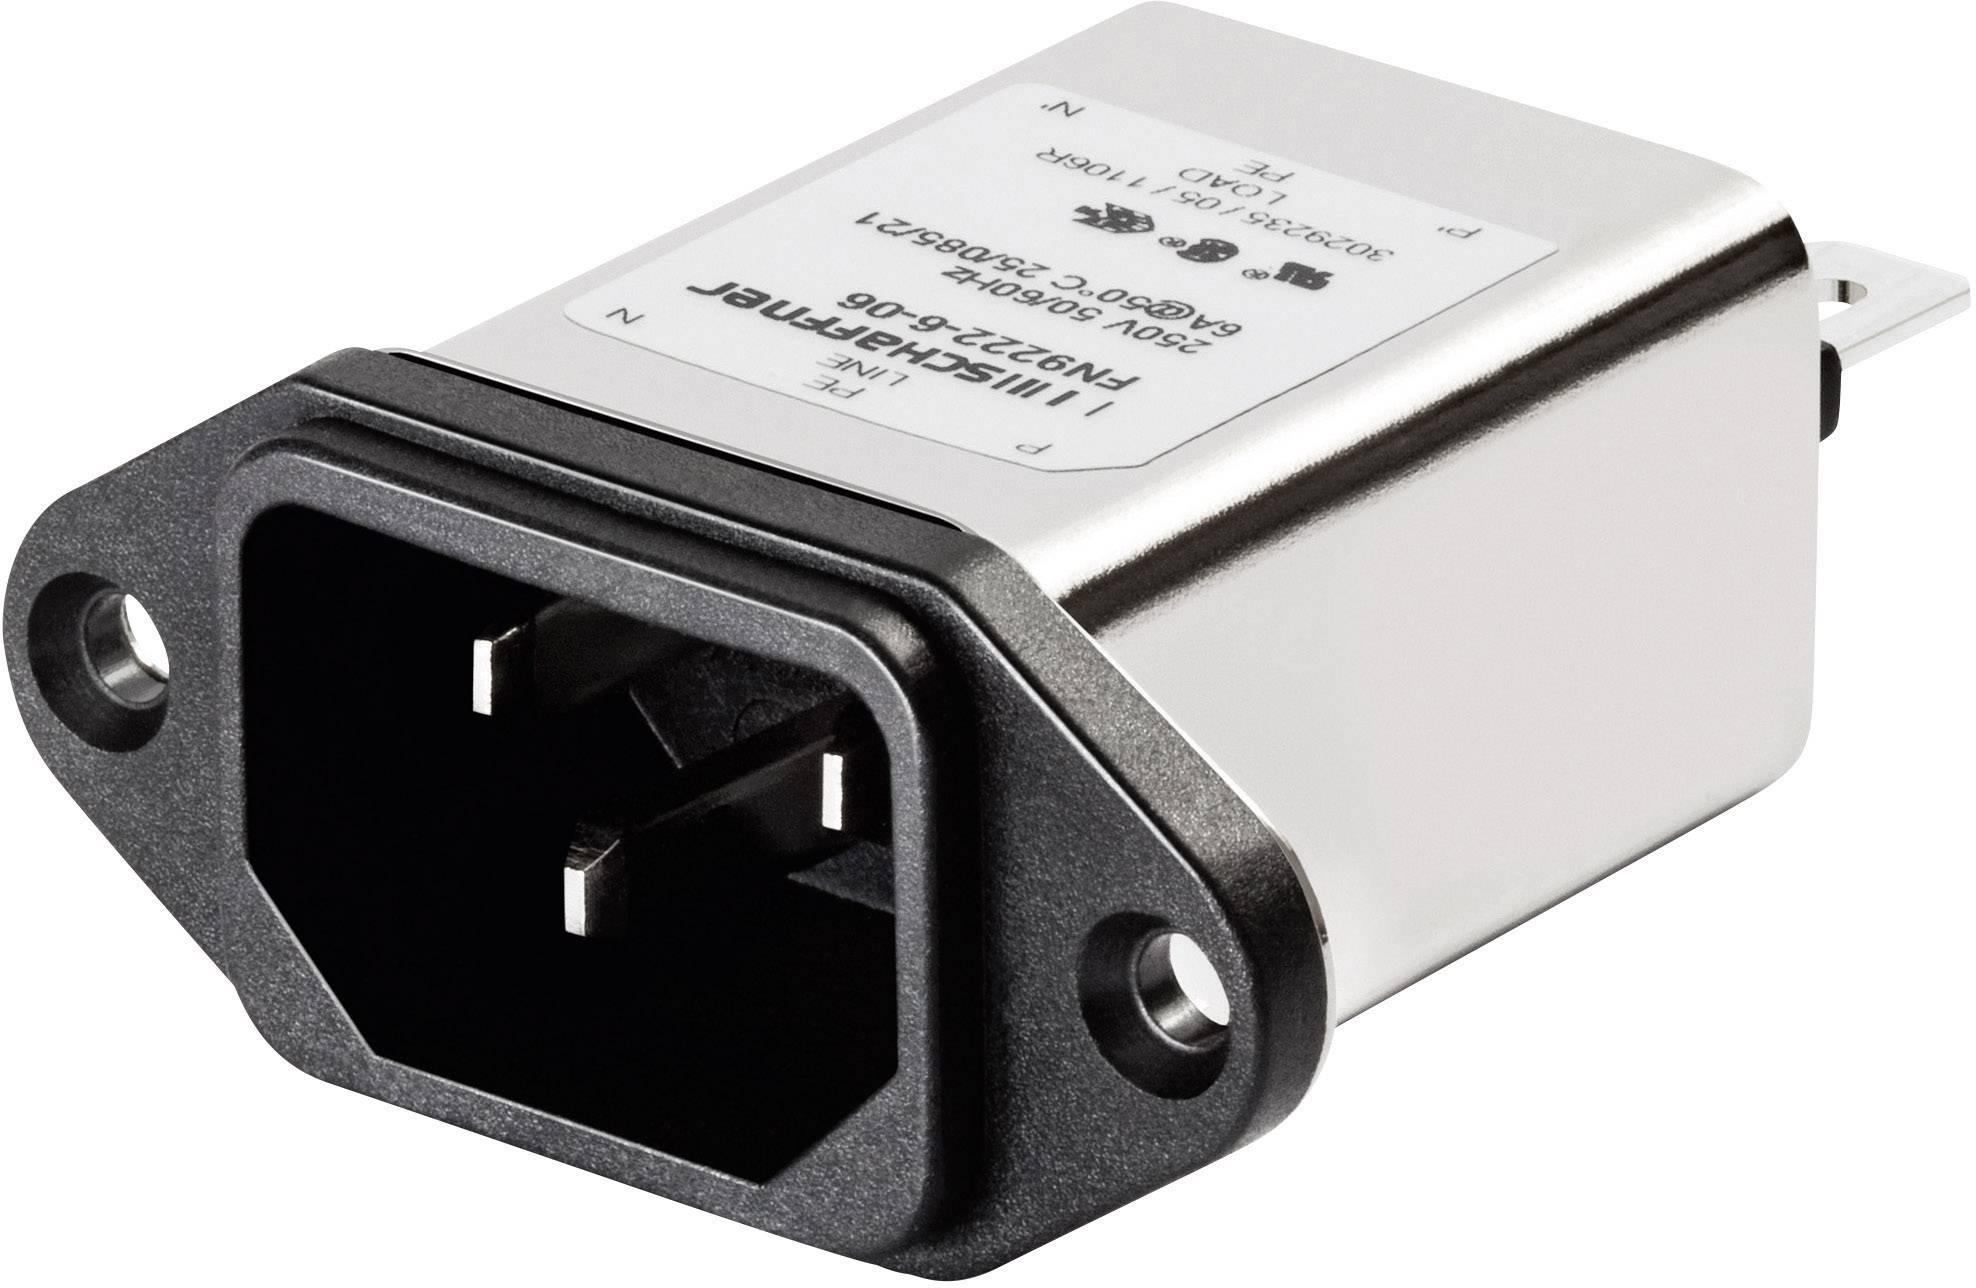 Síťový filtr Schaffner, FN 9222-6-06, 0,78 mH, 250 V/AC, 6 A